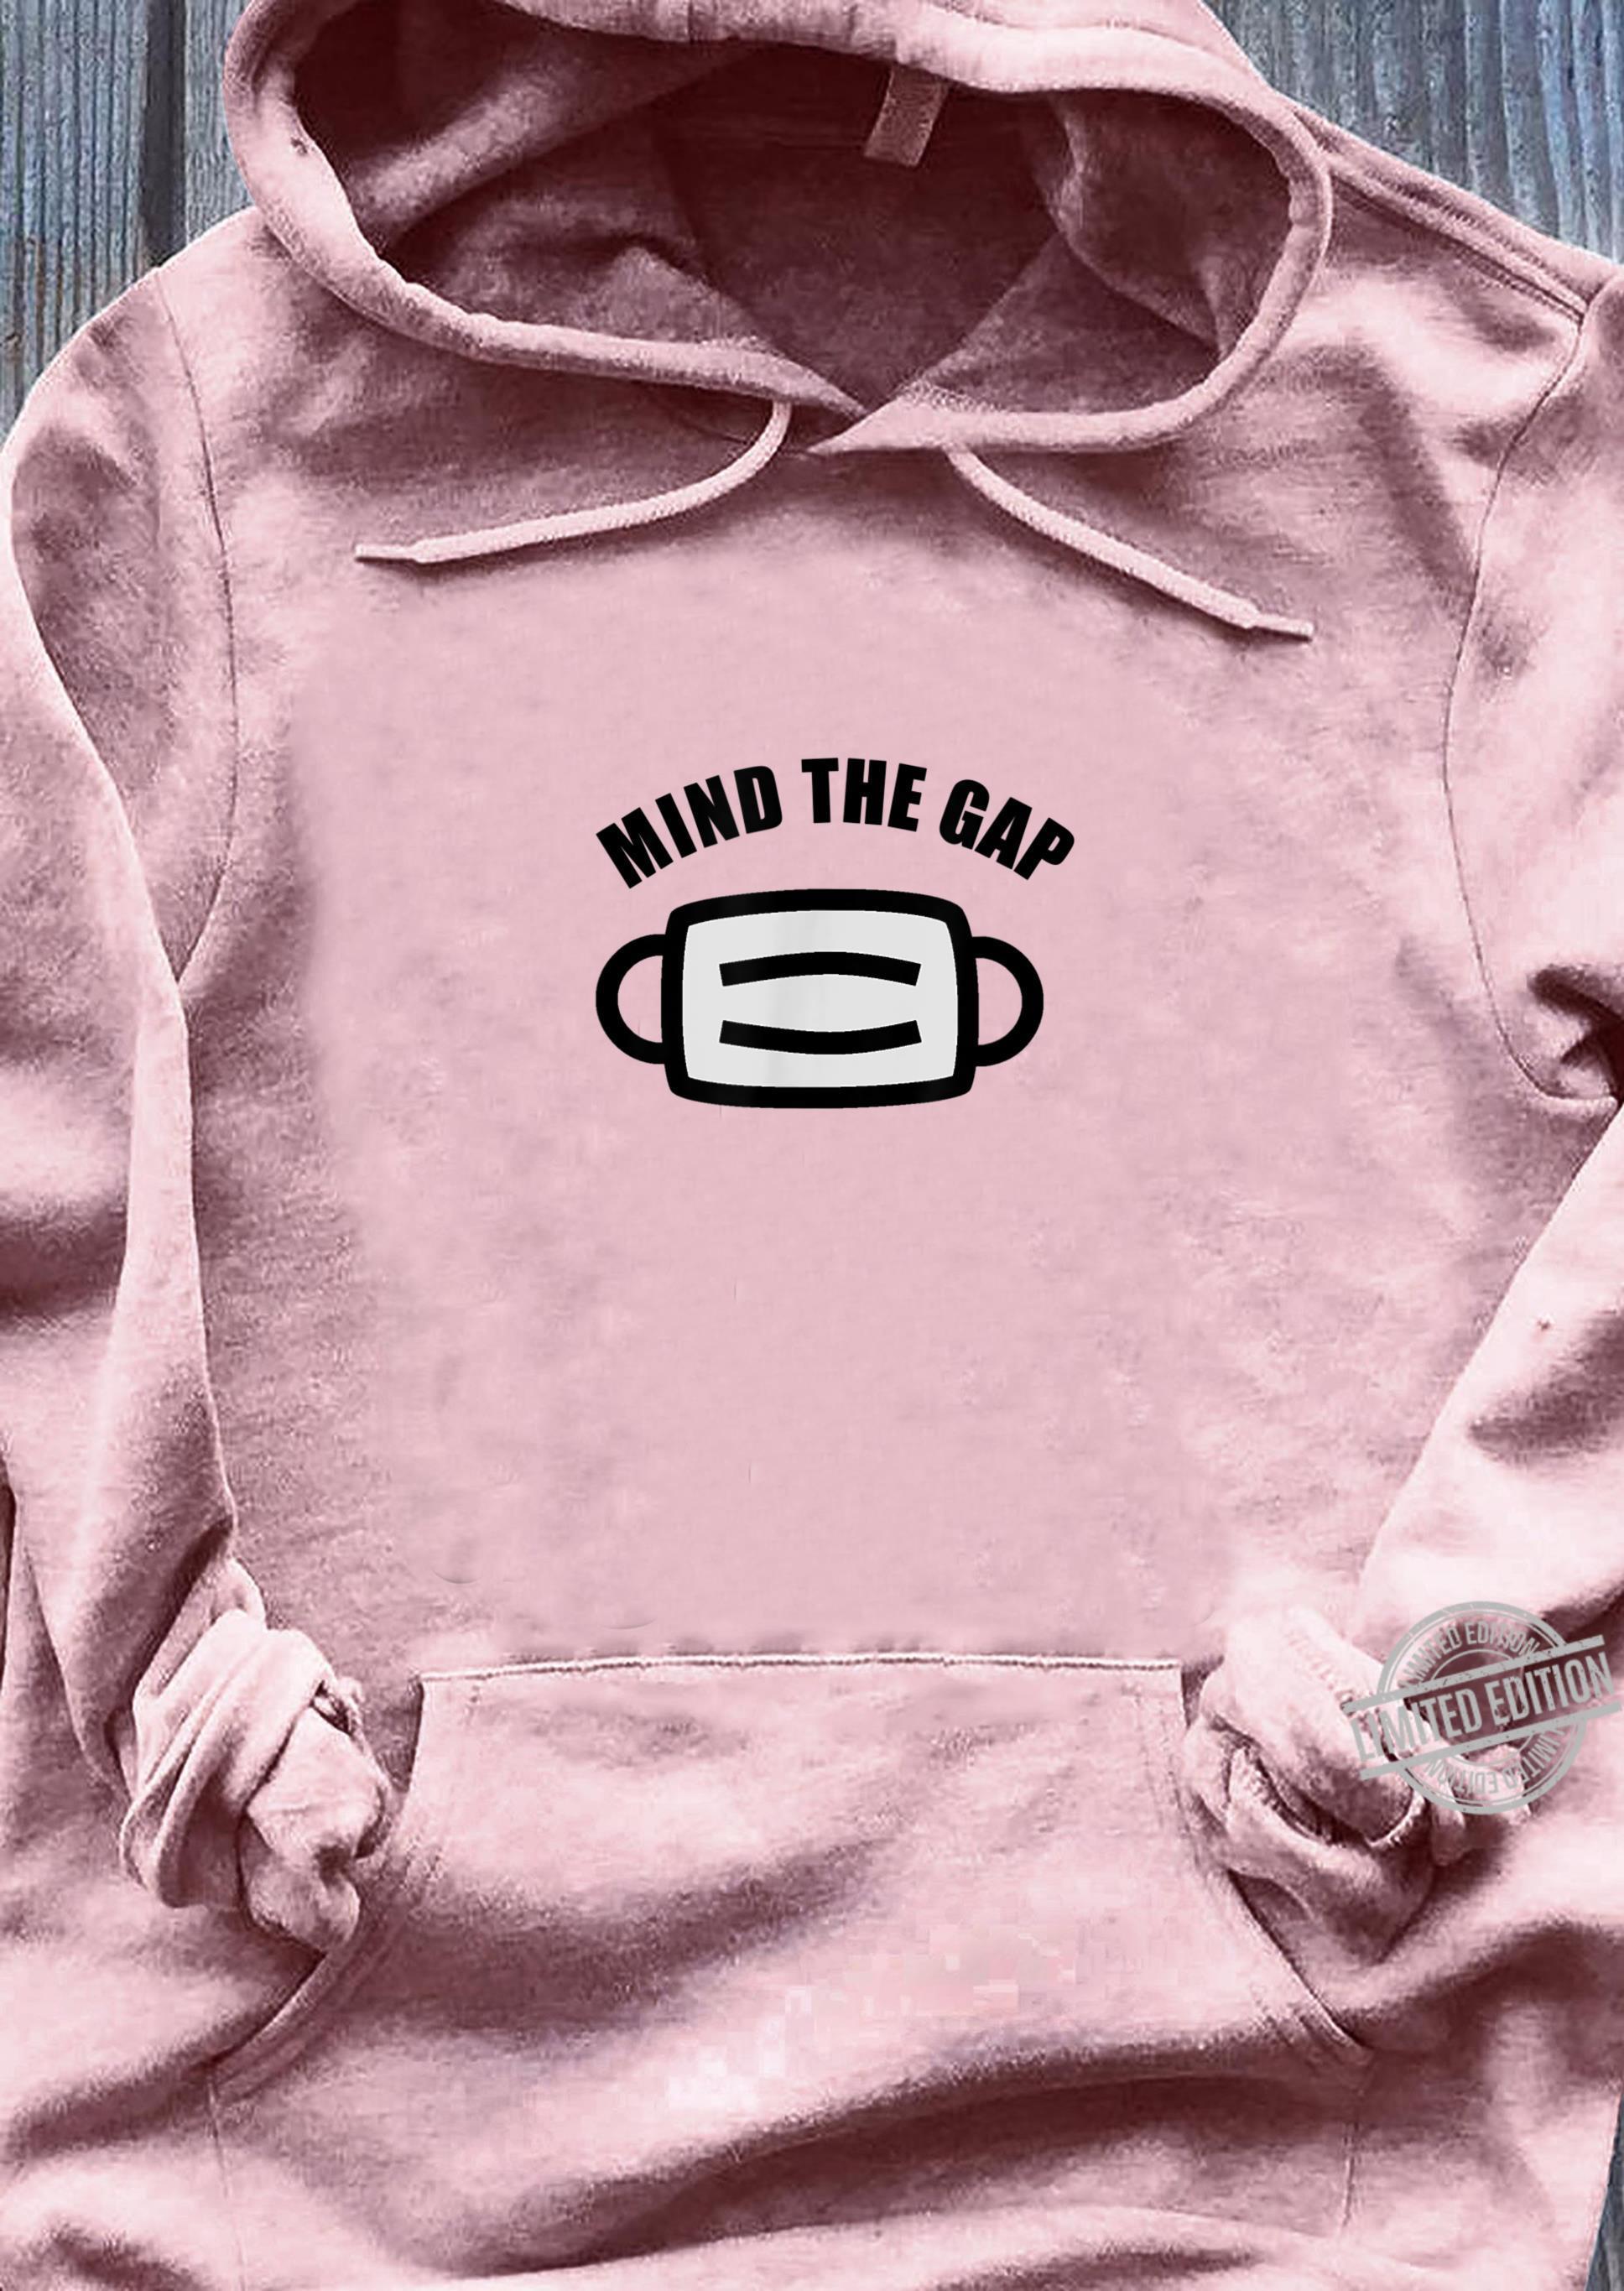 Breathing Mask Mind The Gap Health Awareness Shirt ladies tee